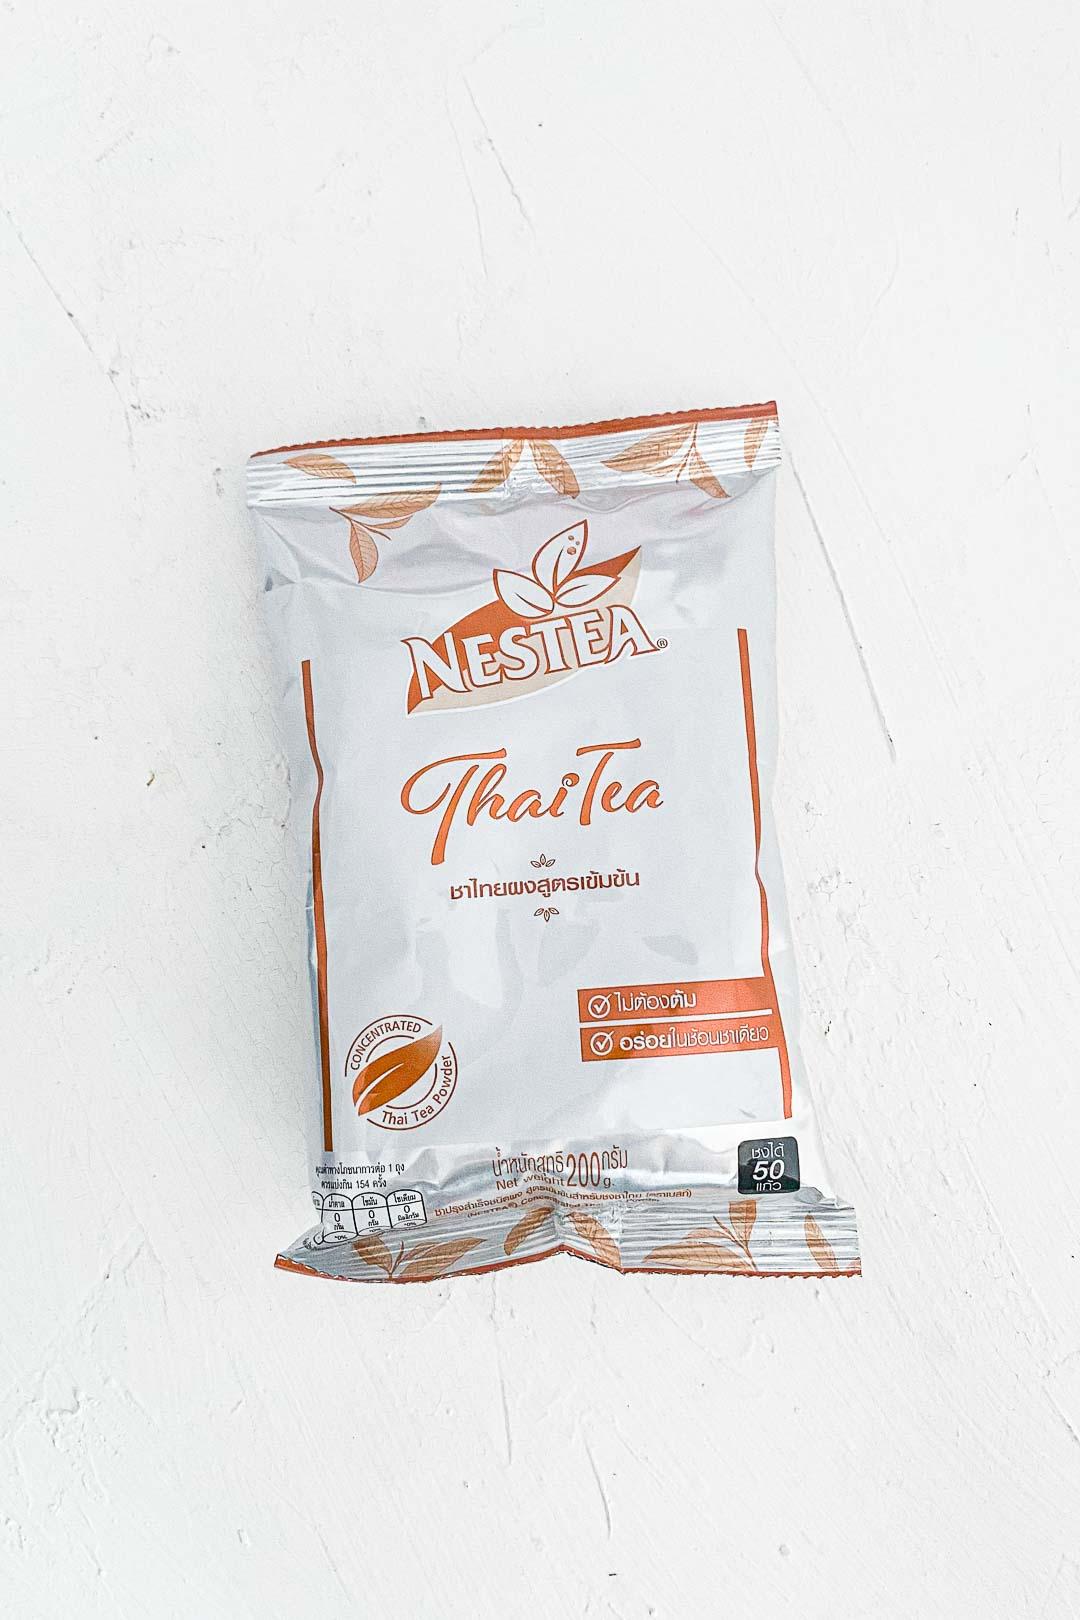 a bag of NESTEA concentrated Thai tea powder